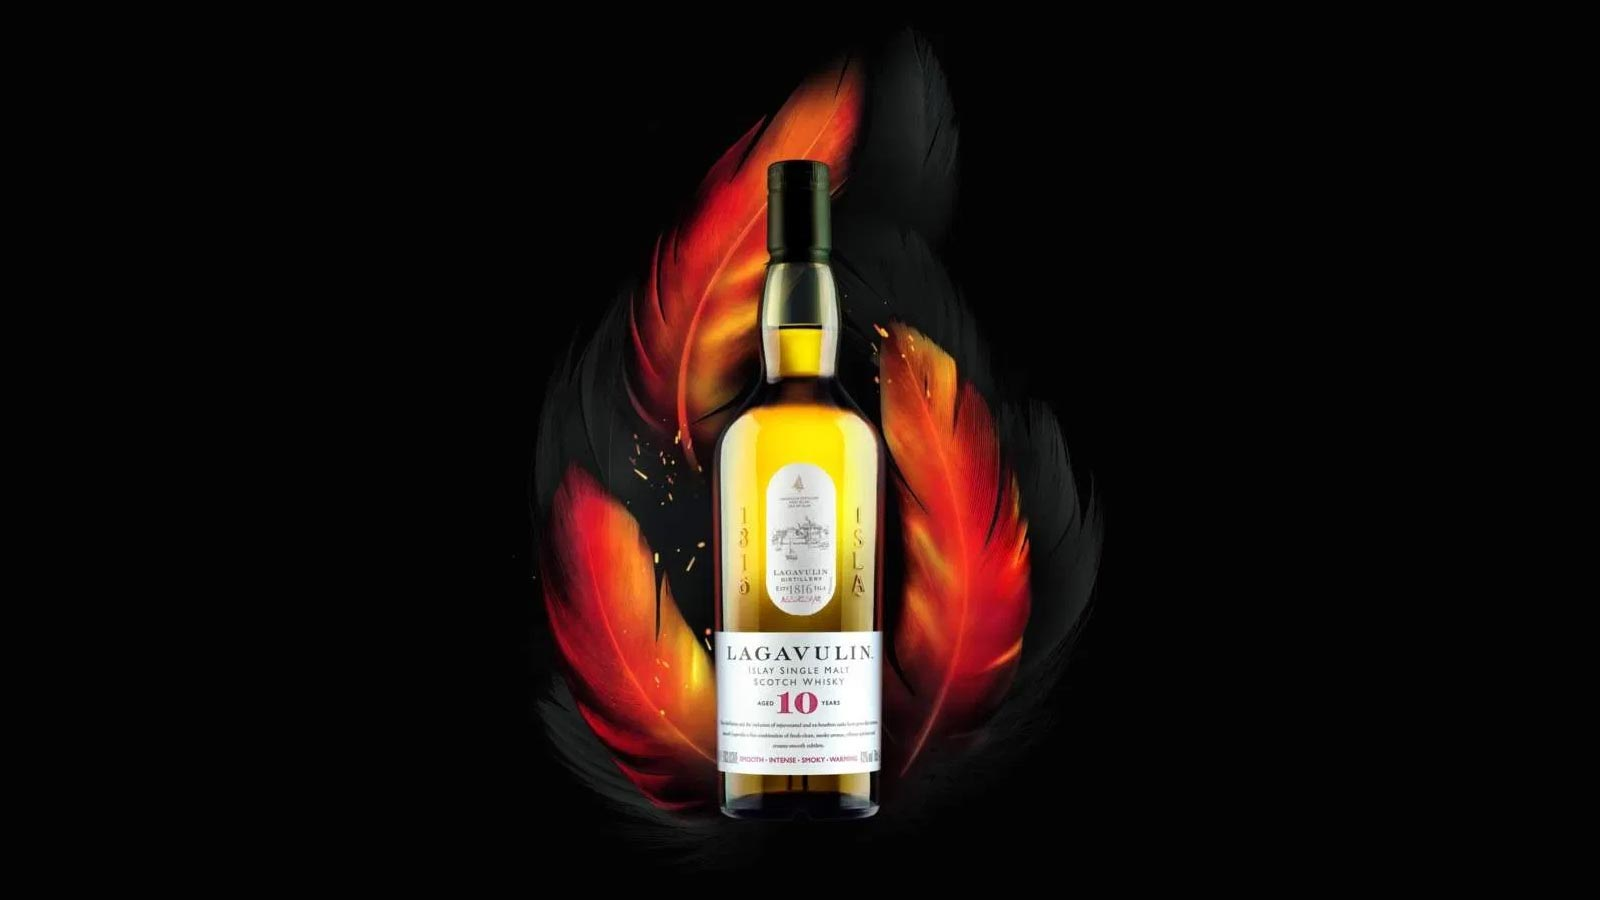 Die neueste Kreation: Lagavulin 10 Year Old Islay Single Malt Scotch Whisky